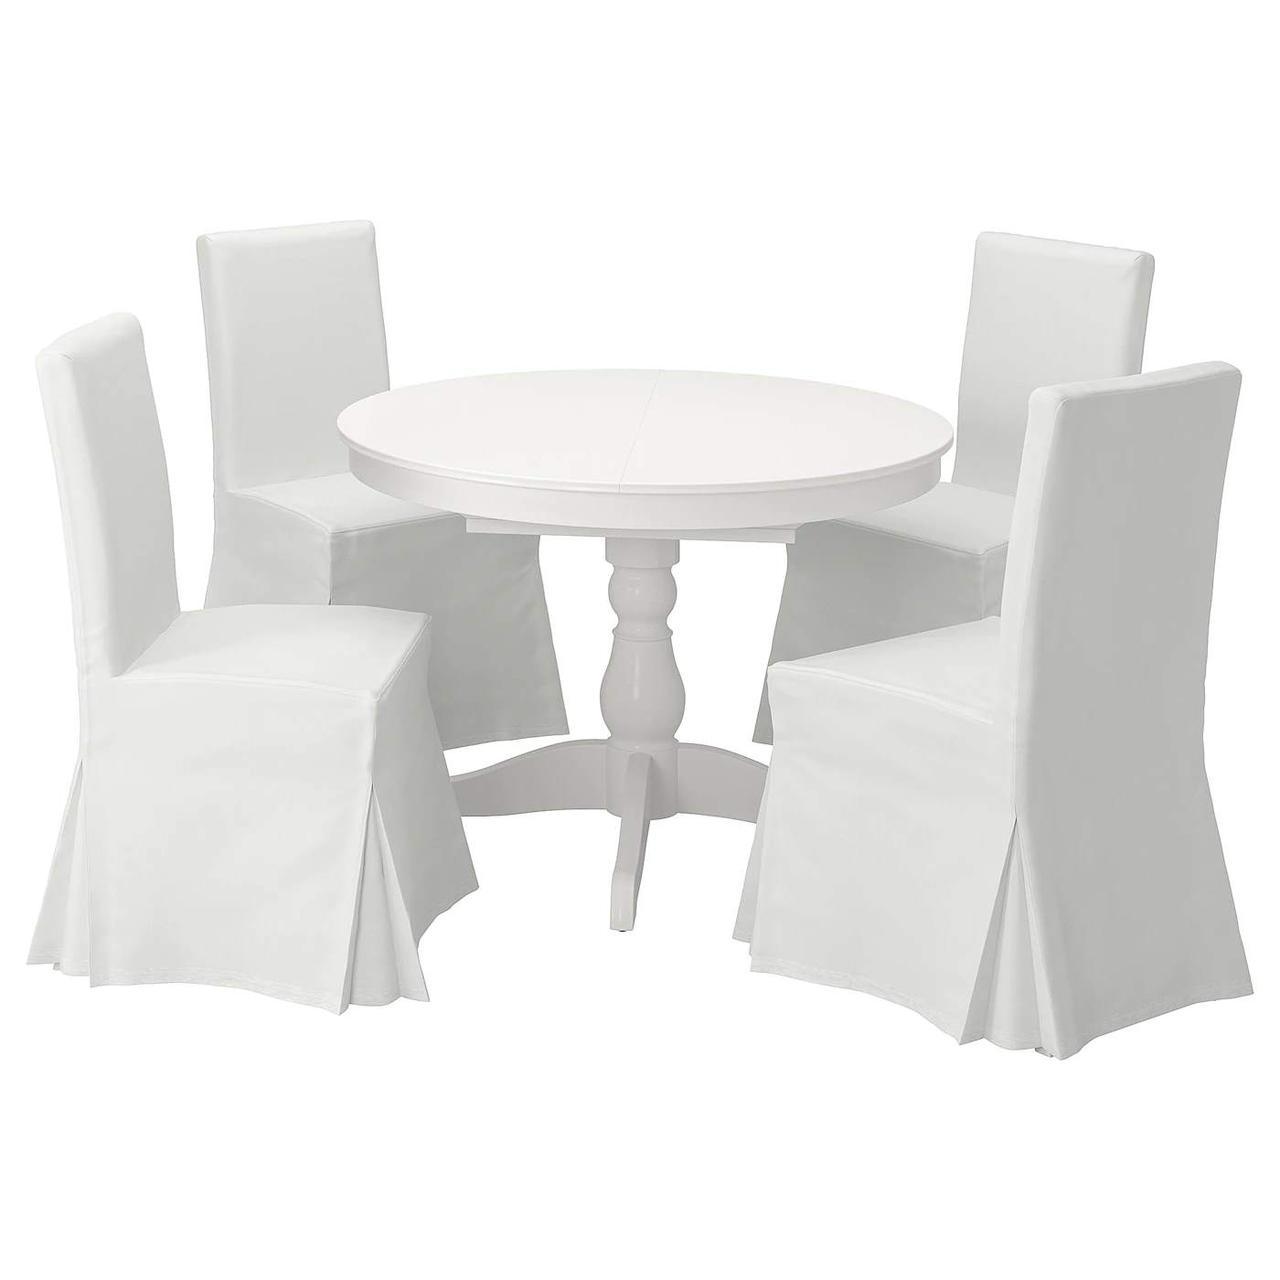 Стол и 4 стула INGATORP / HENRIKSDAL